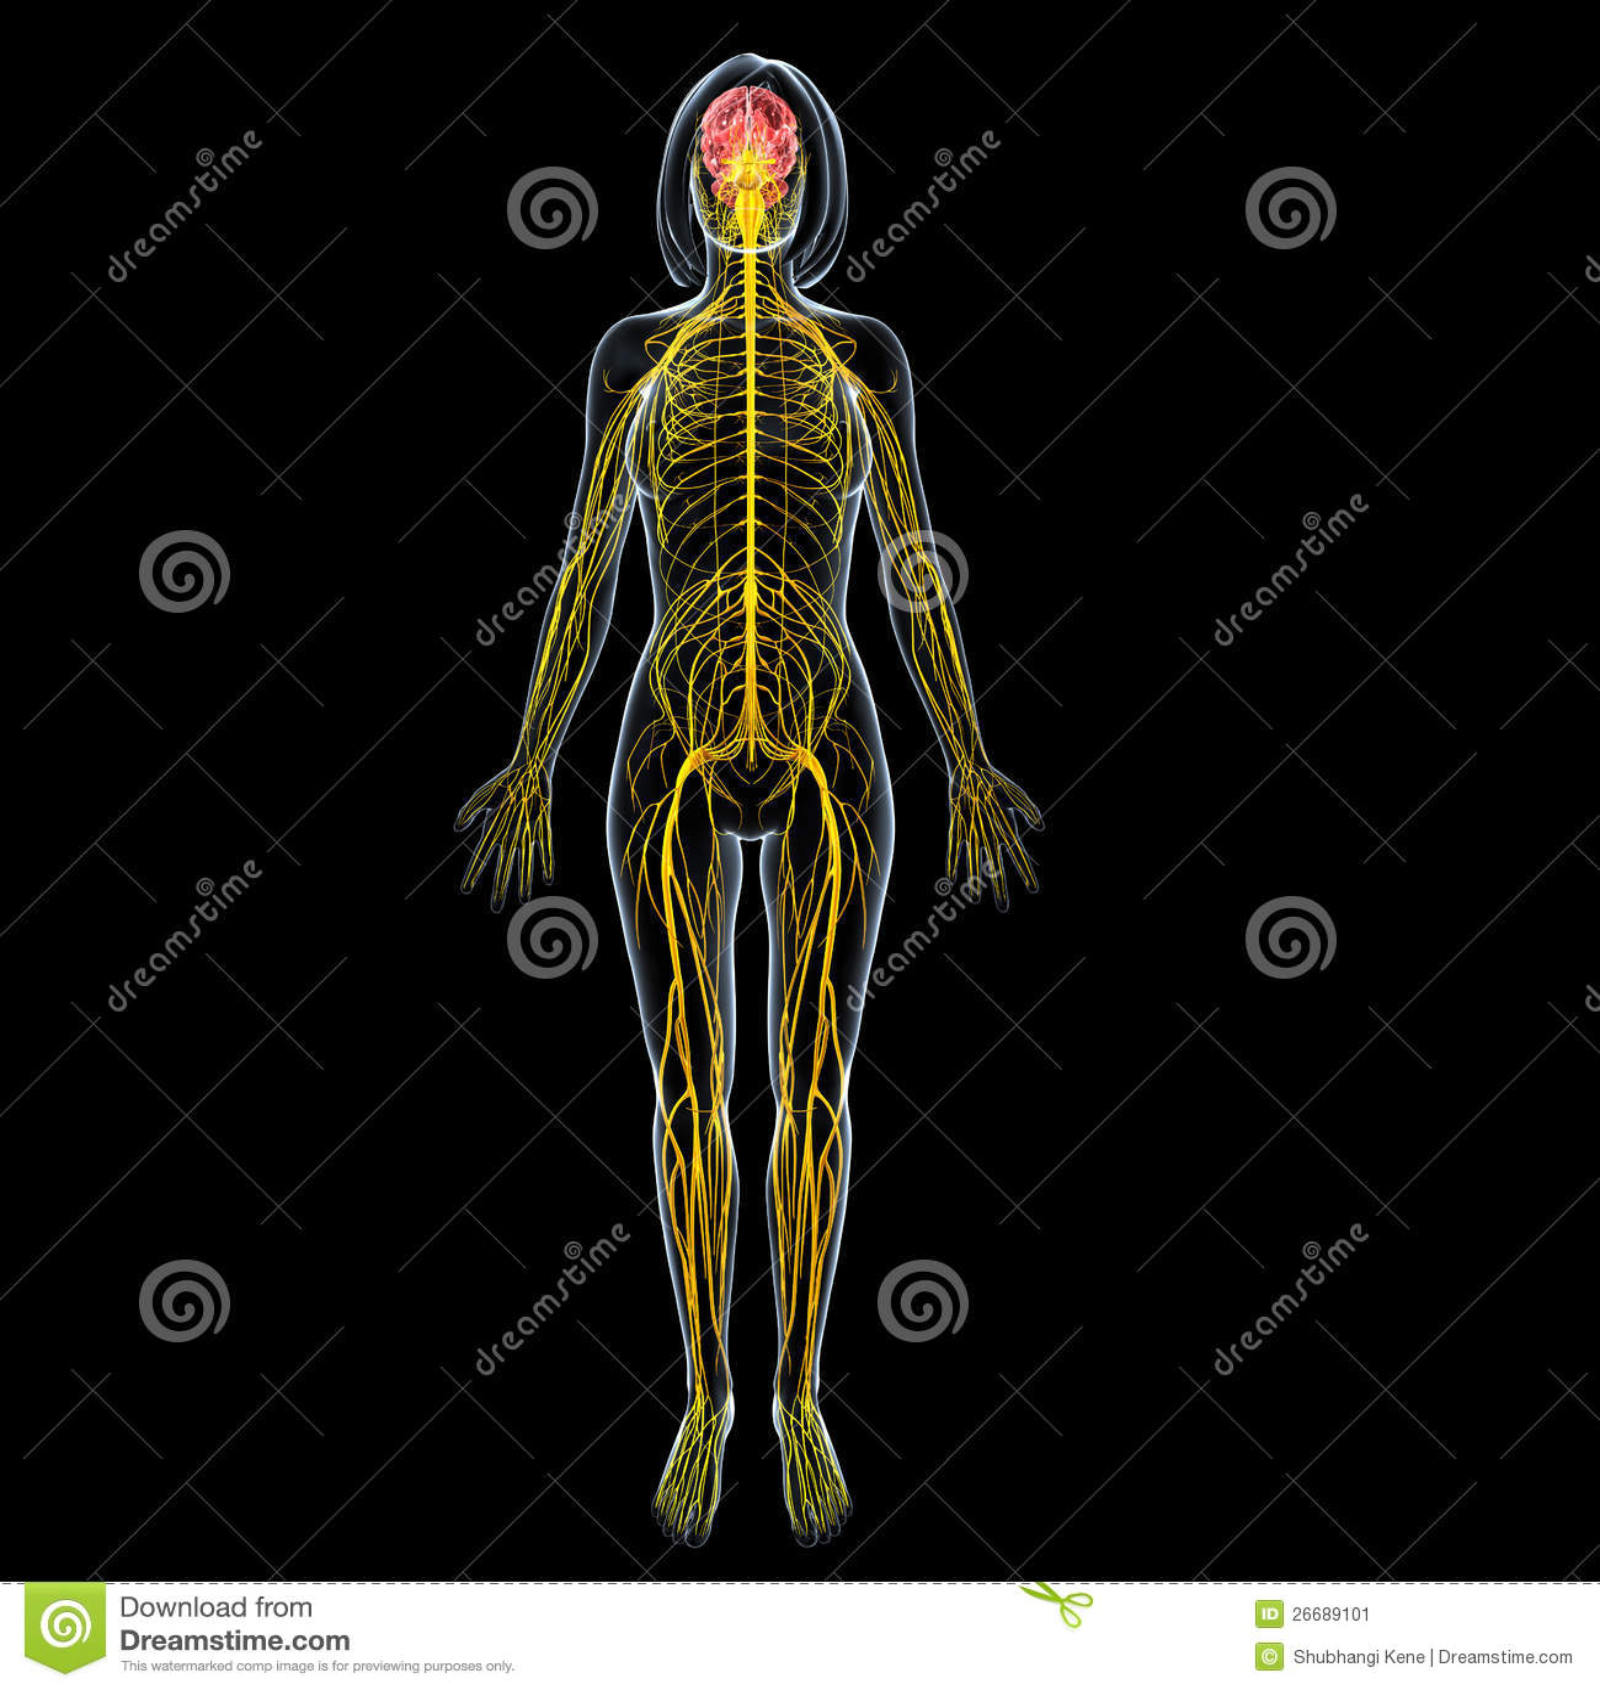 FeMale Brain Anatomy With Full Body Nervous System Stock ...